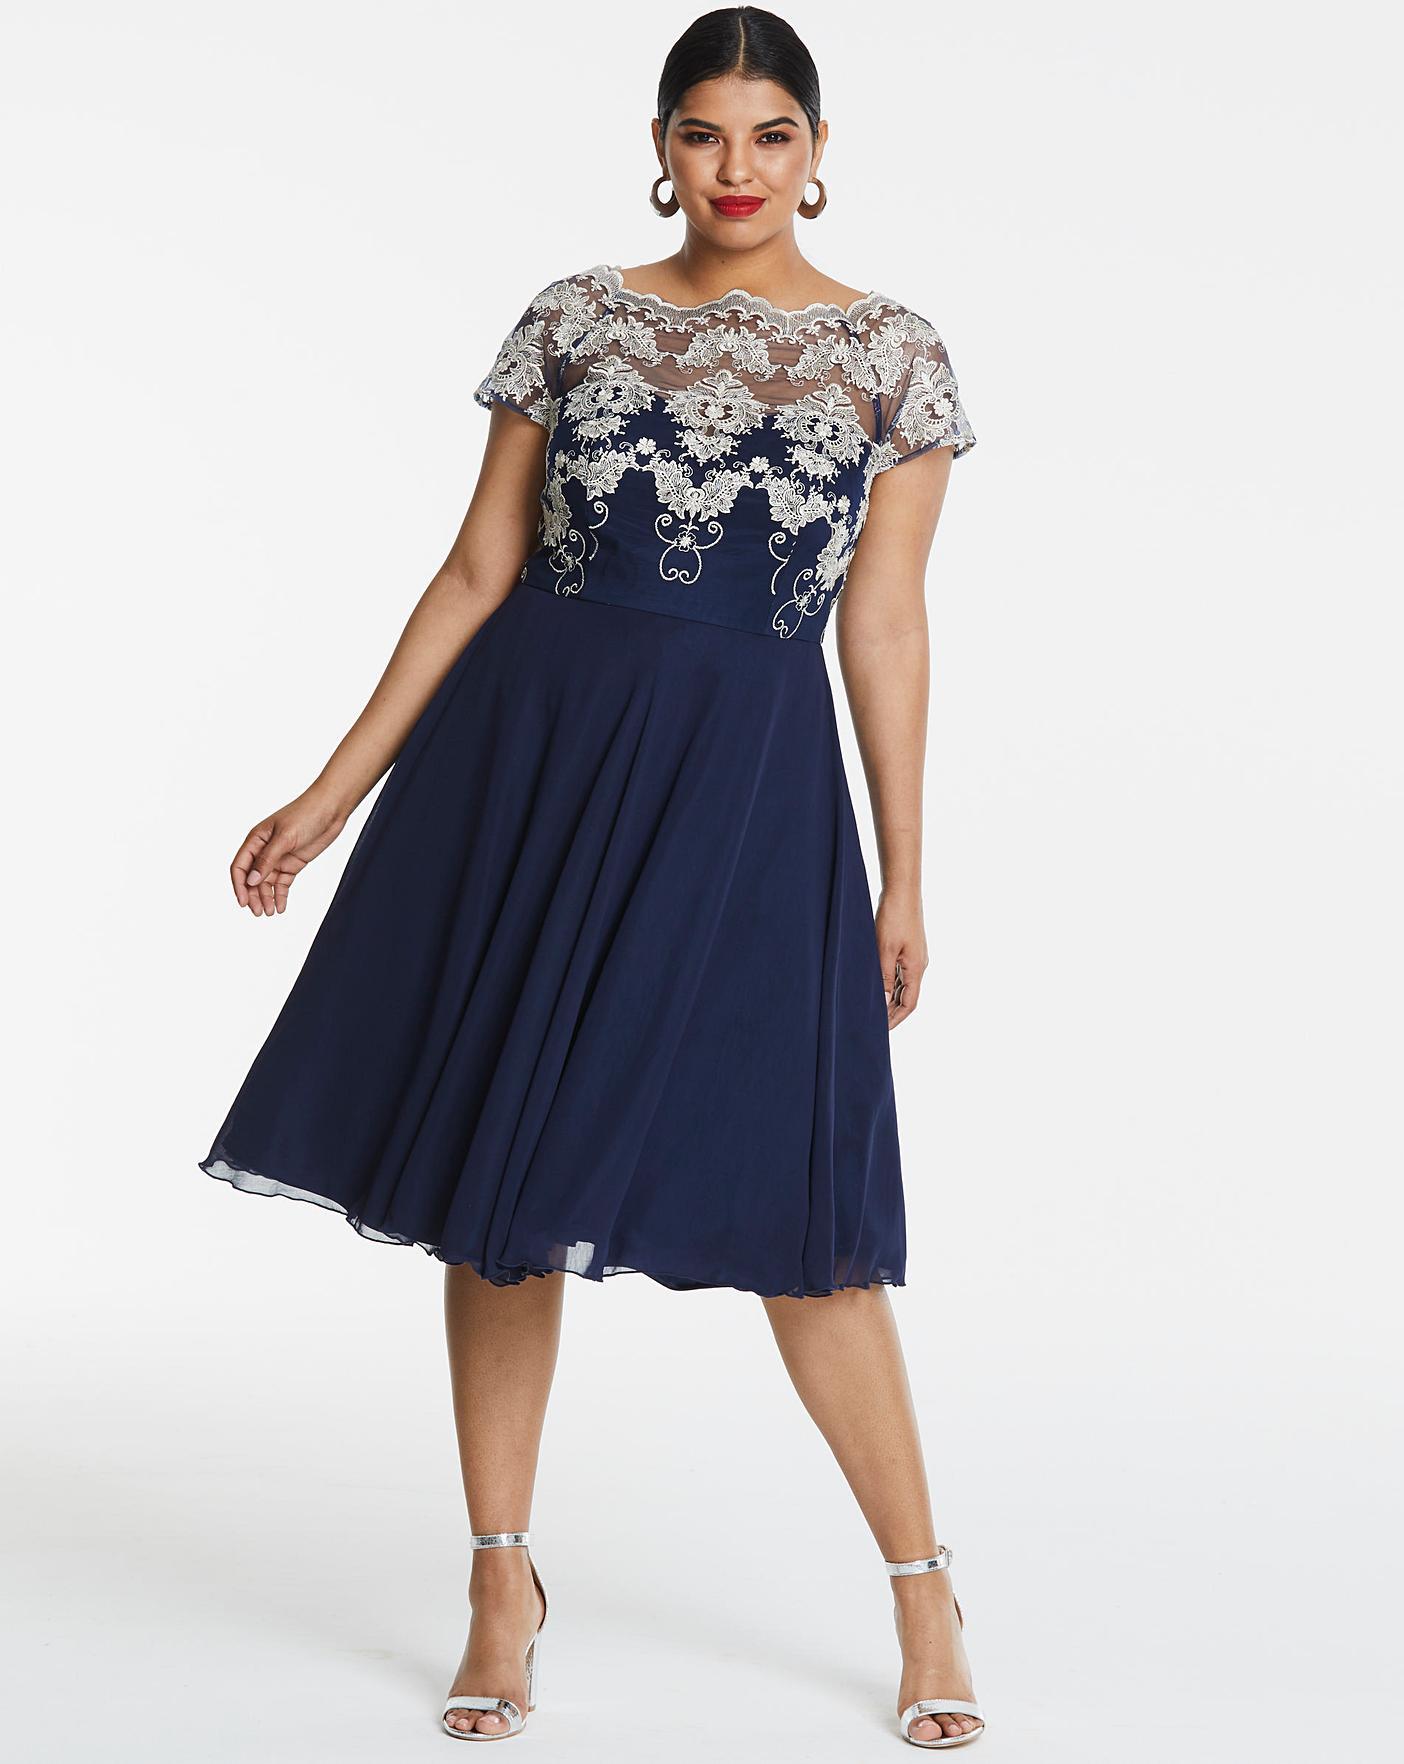 417fb49ff252 Chi Chi London Navy Lace Midi Dress   Simply Be